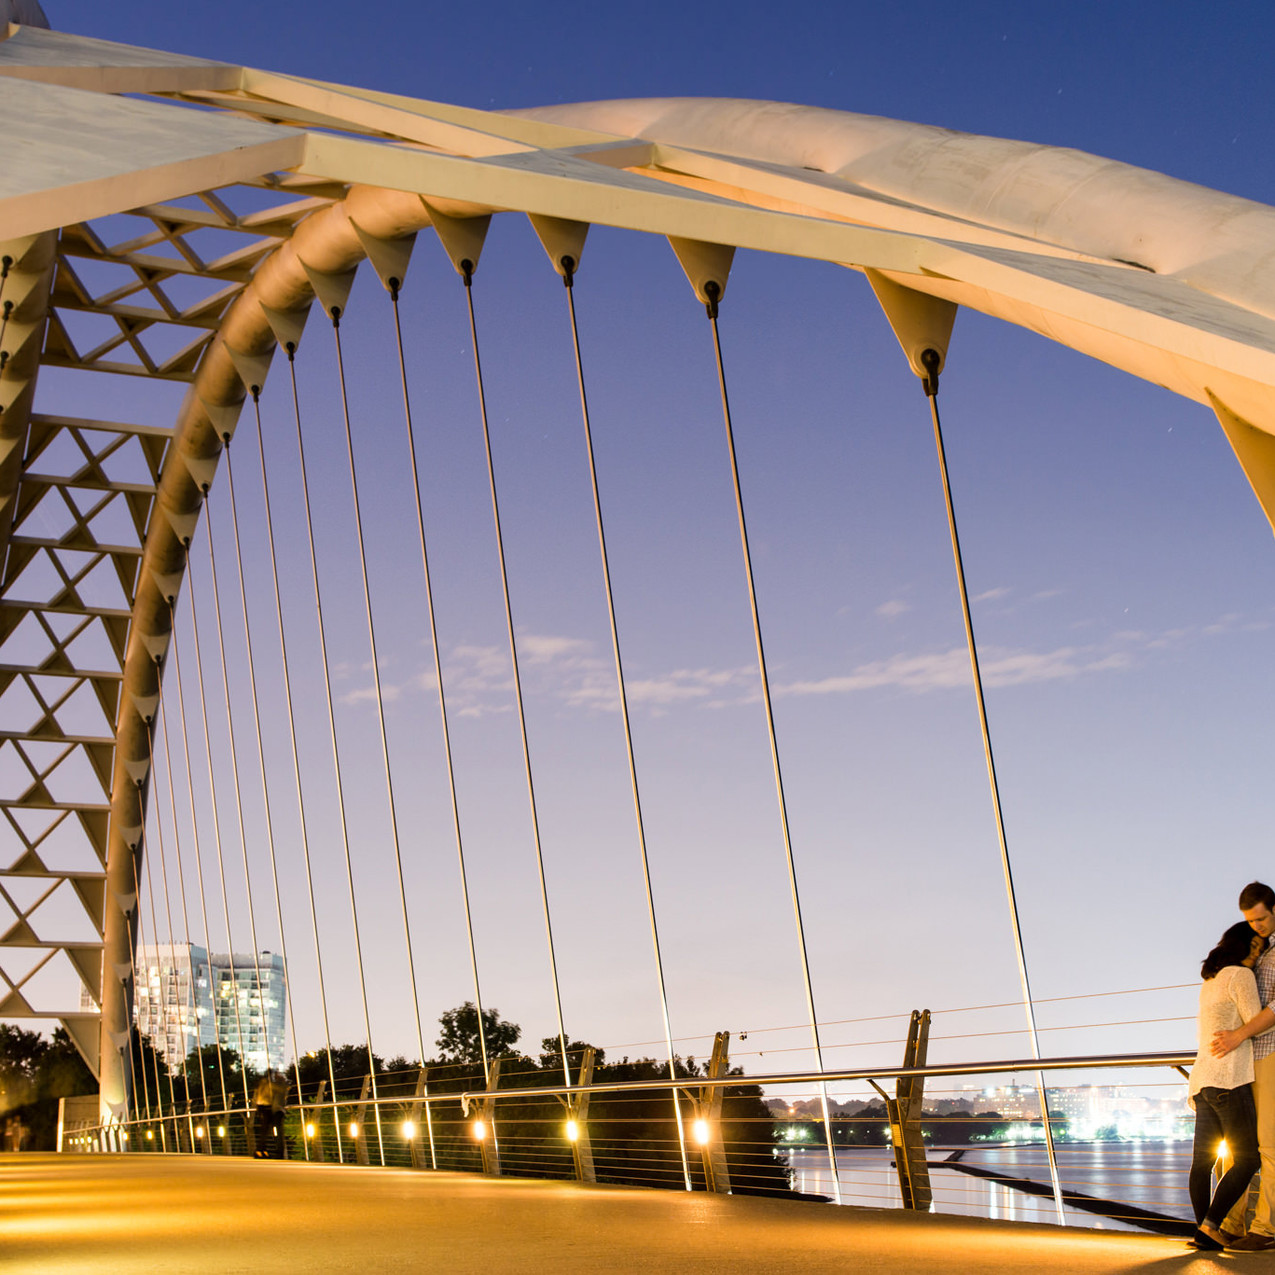 the-one-bridal-humber-bay-arch-bridge-co